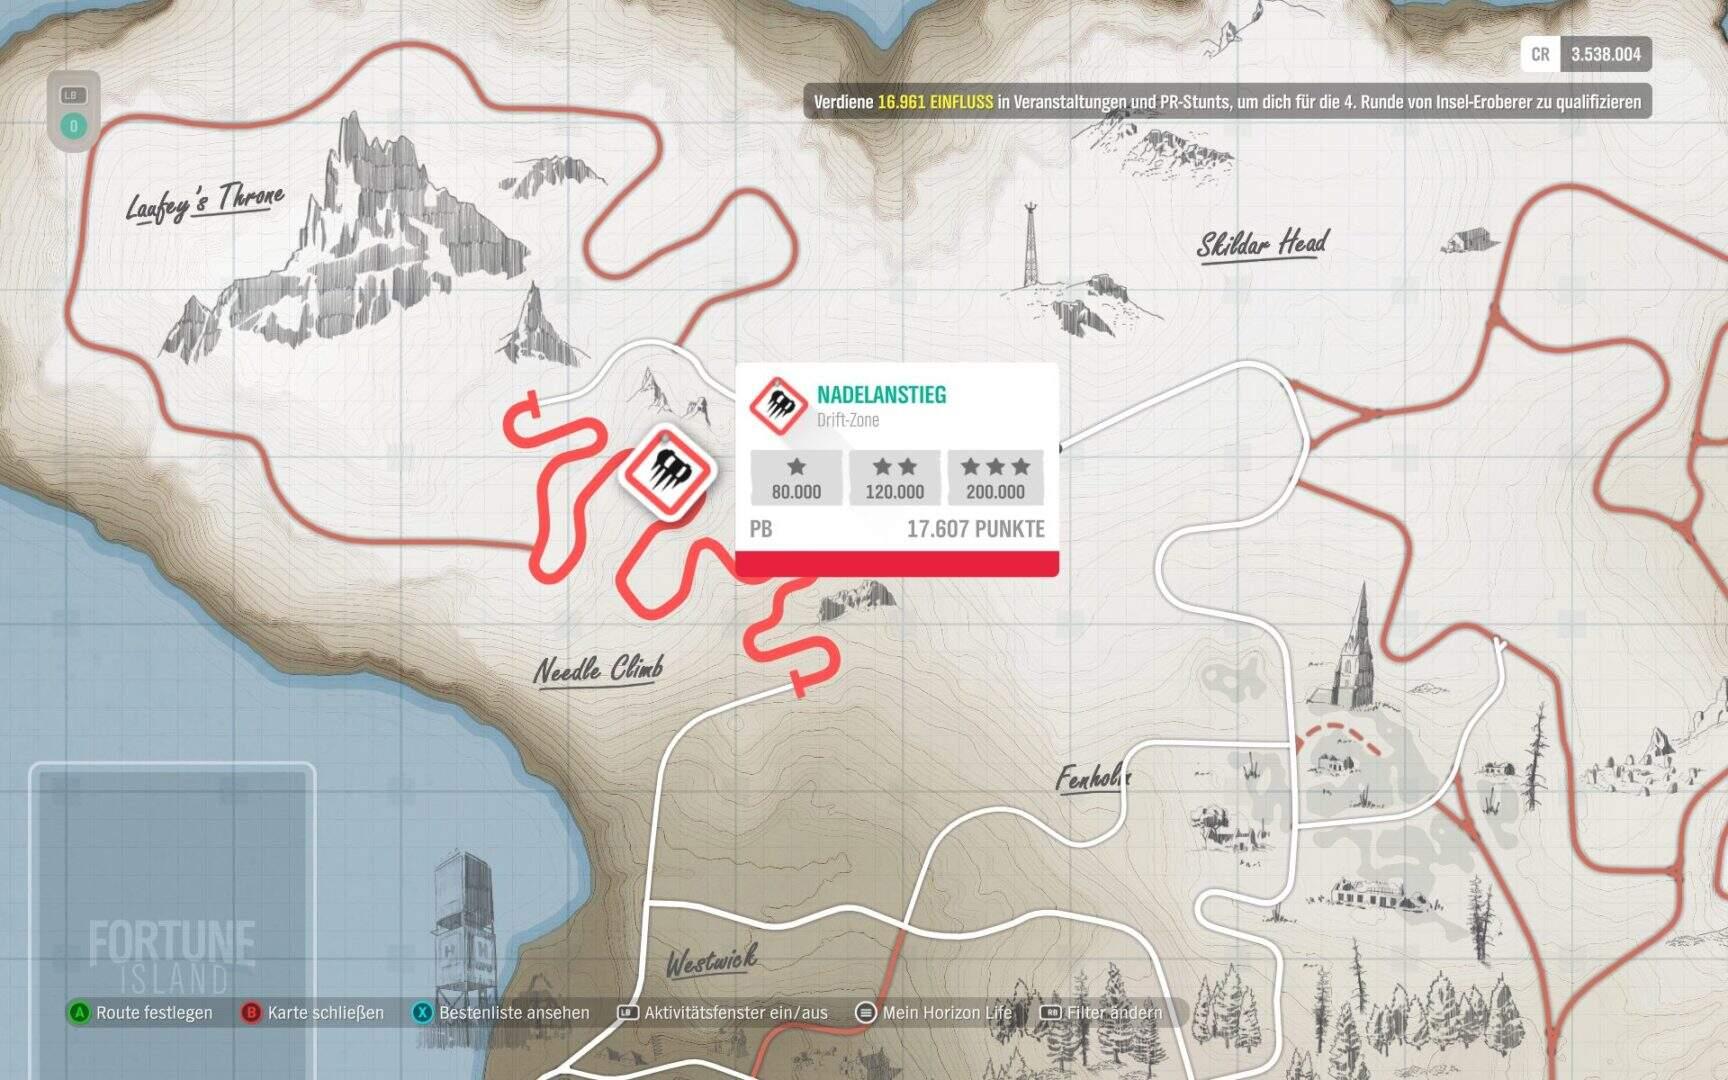 Forza Horizon 4 Fotune Island Nadelanstieg